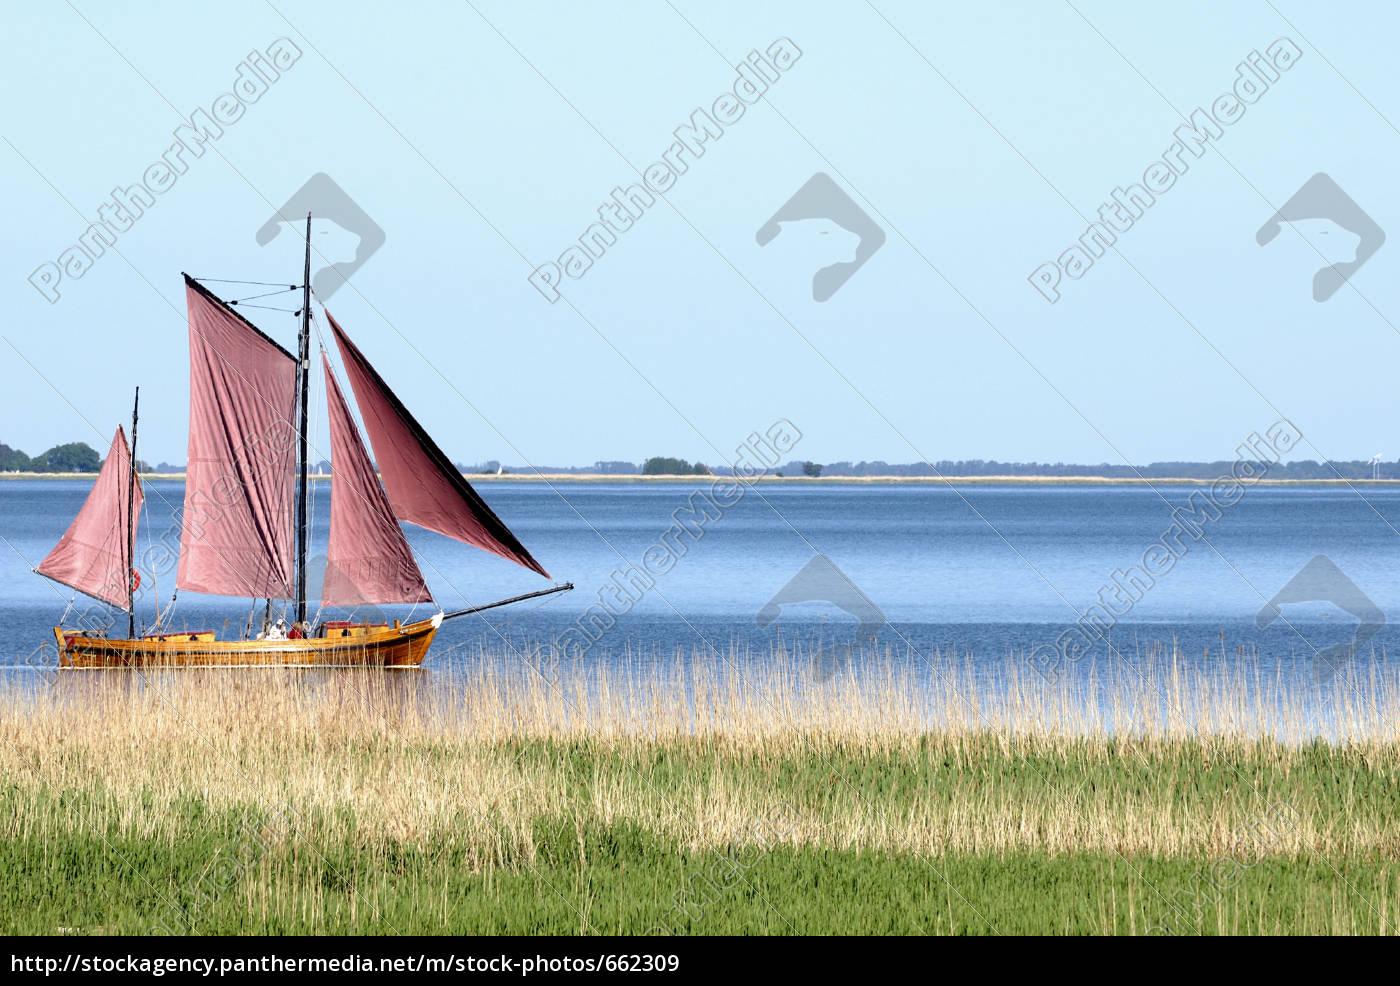 zeesboot - 662309